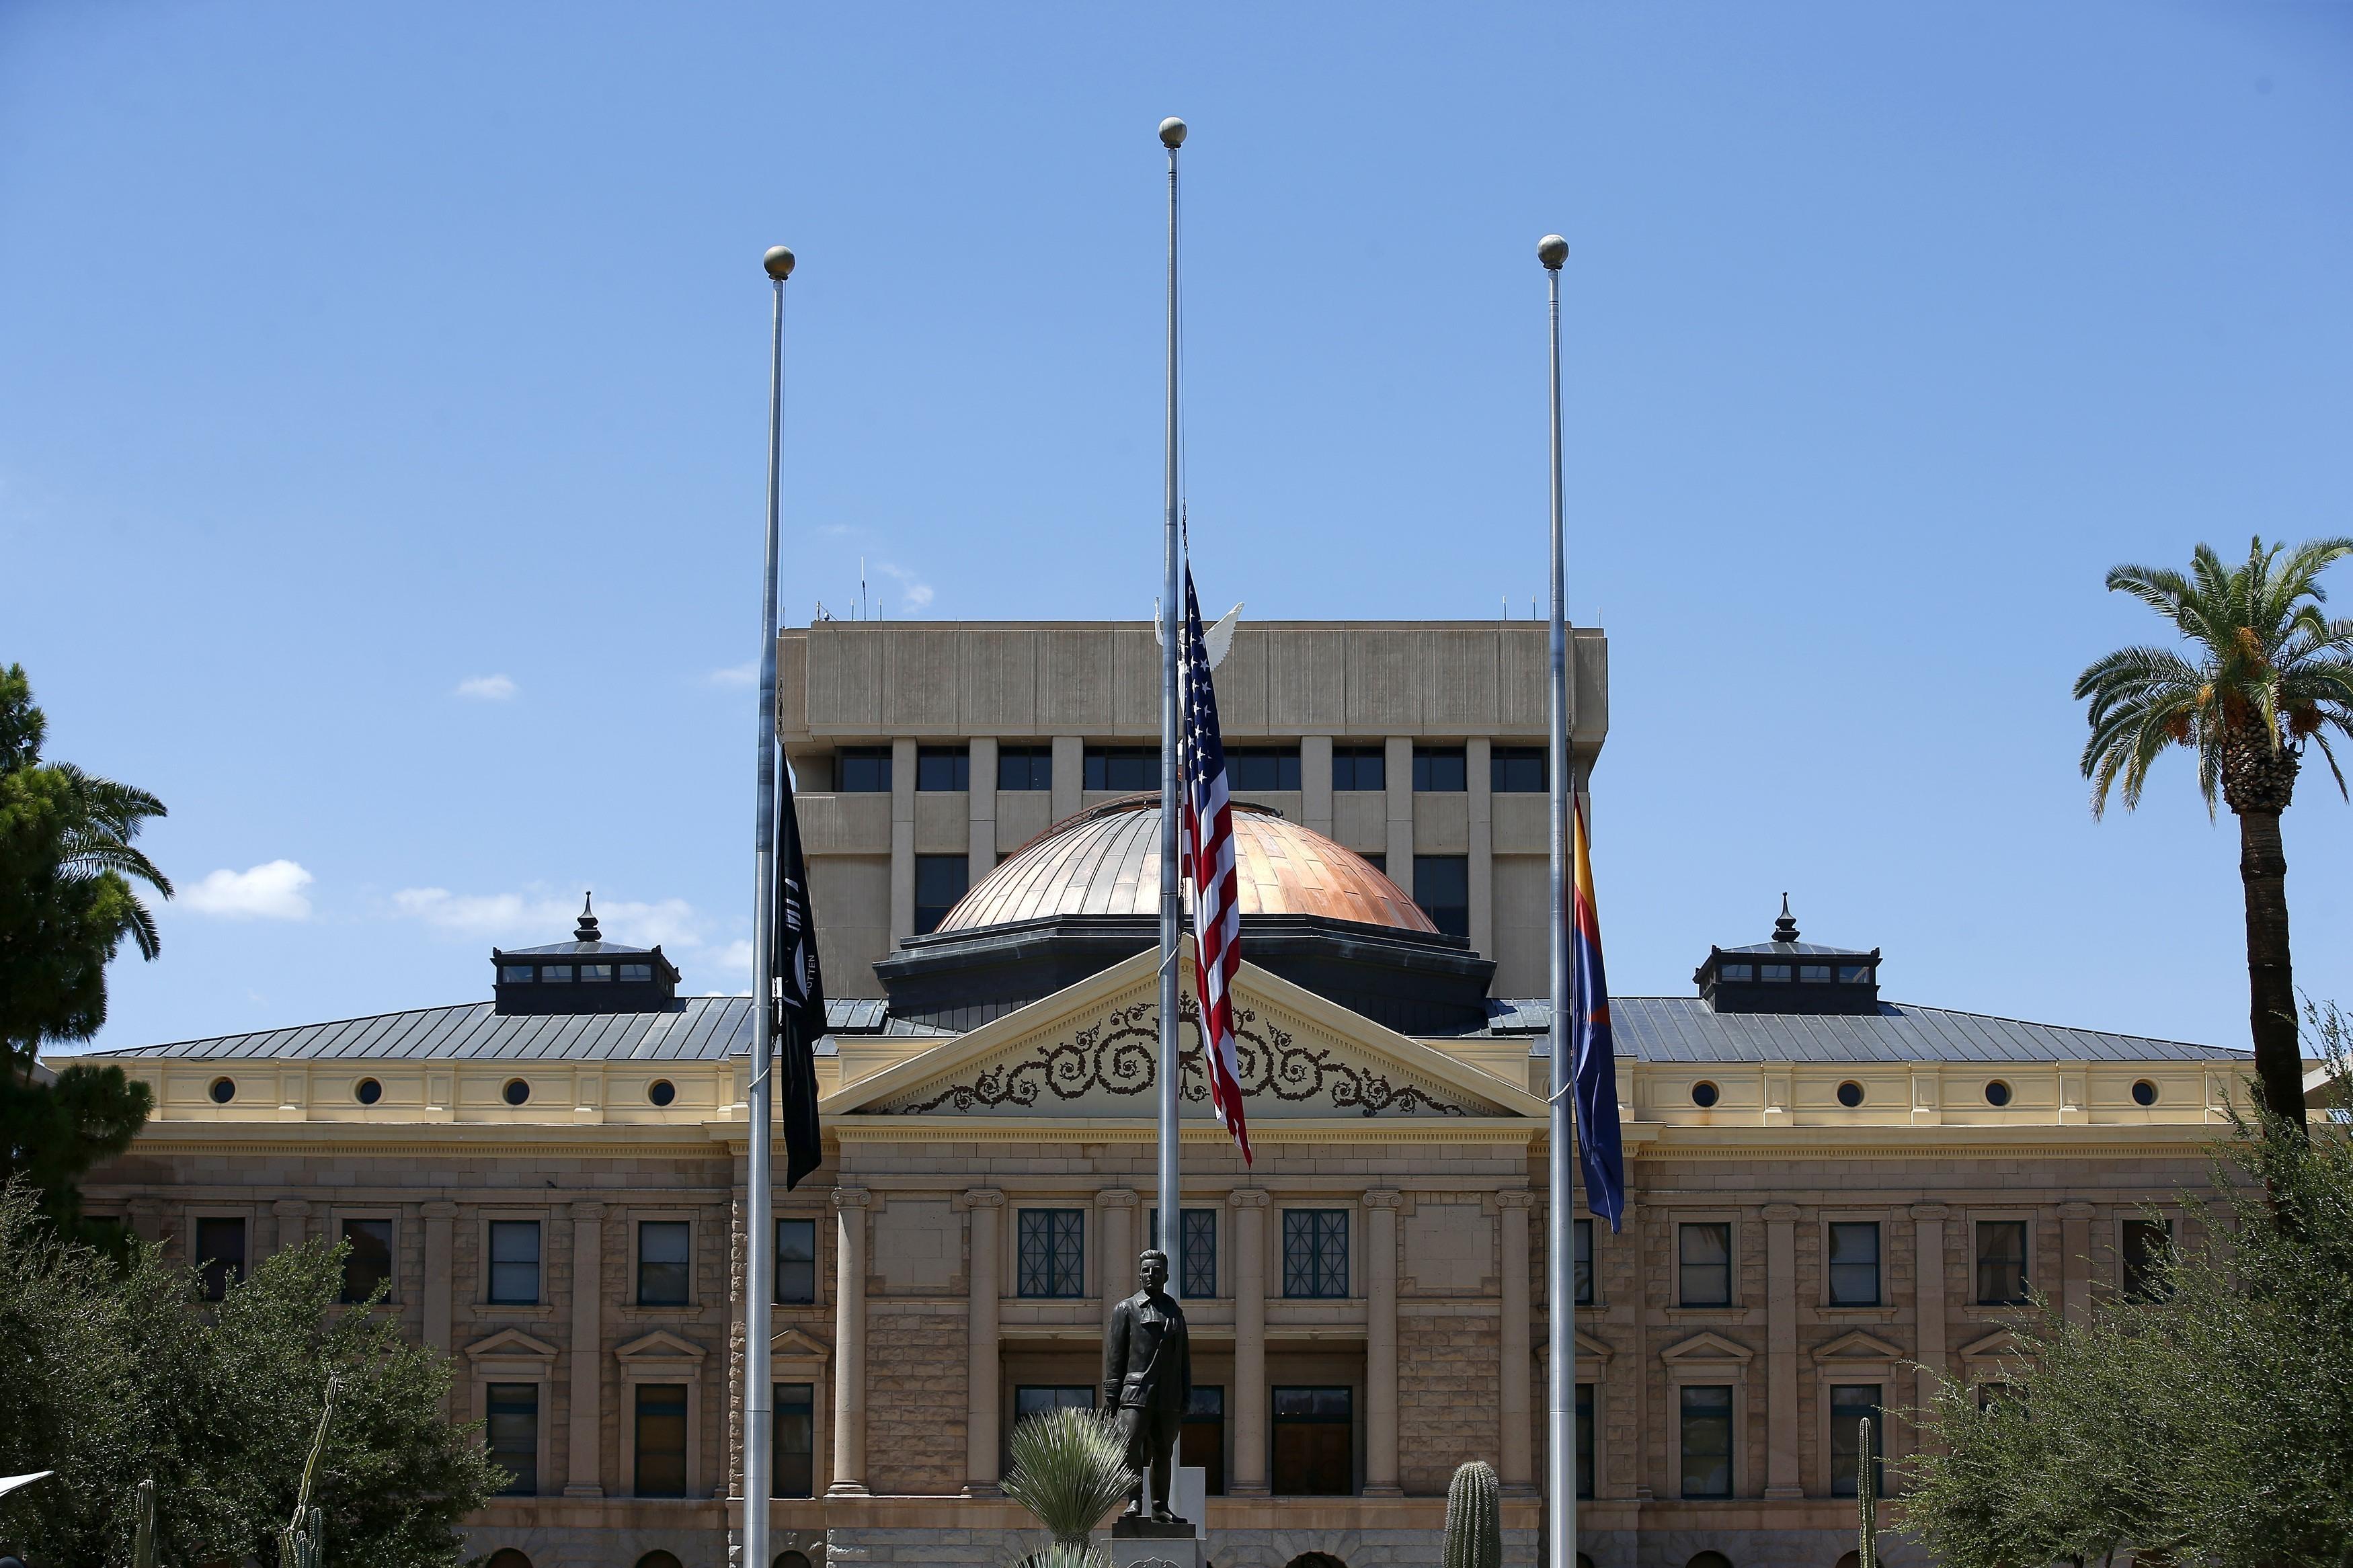 Flags fly at half-staff at the Arizona Capitol in memory of Sen. John McCain on Sunday.